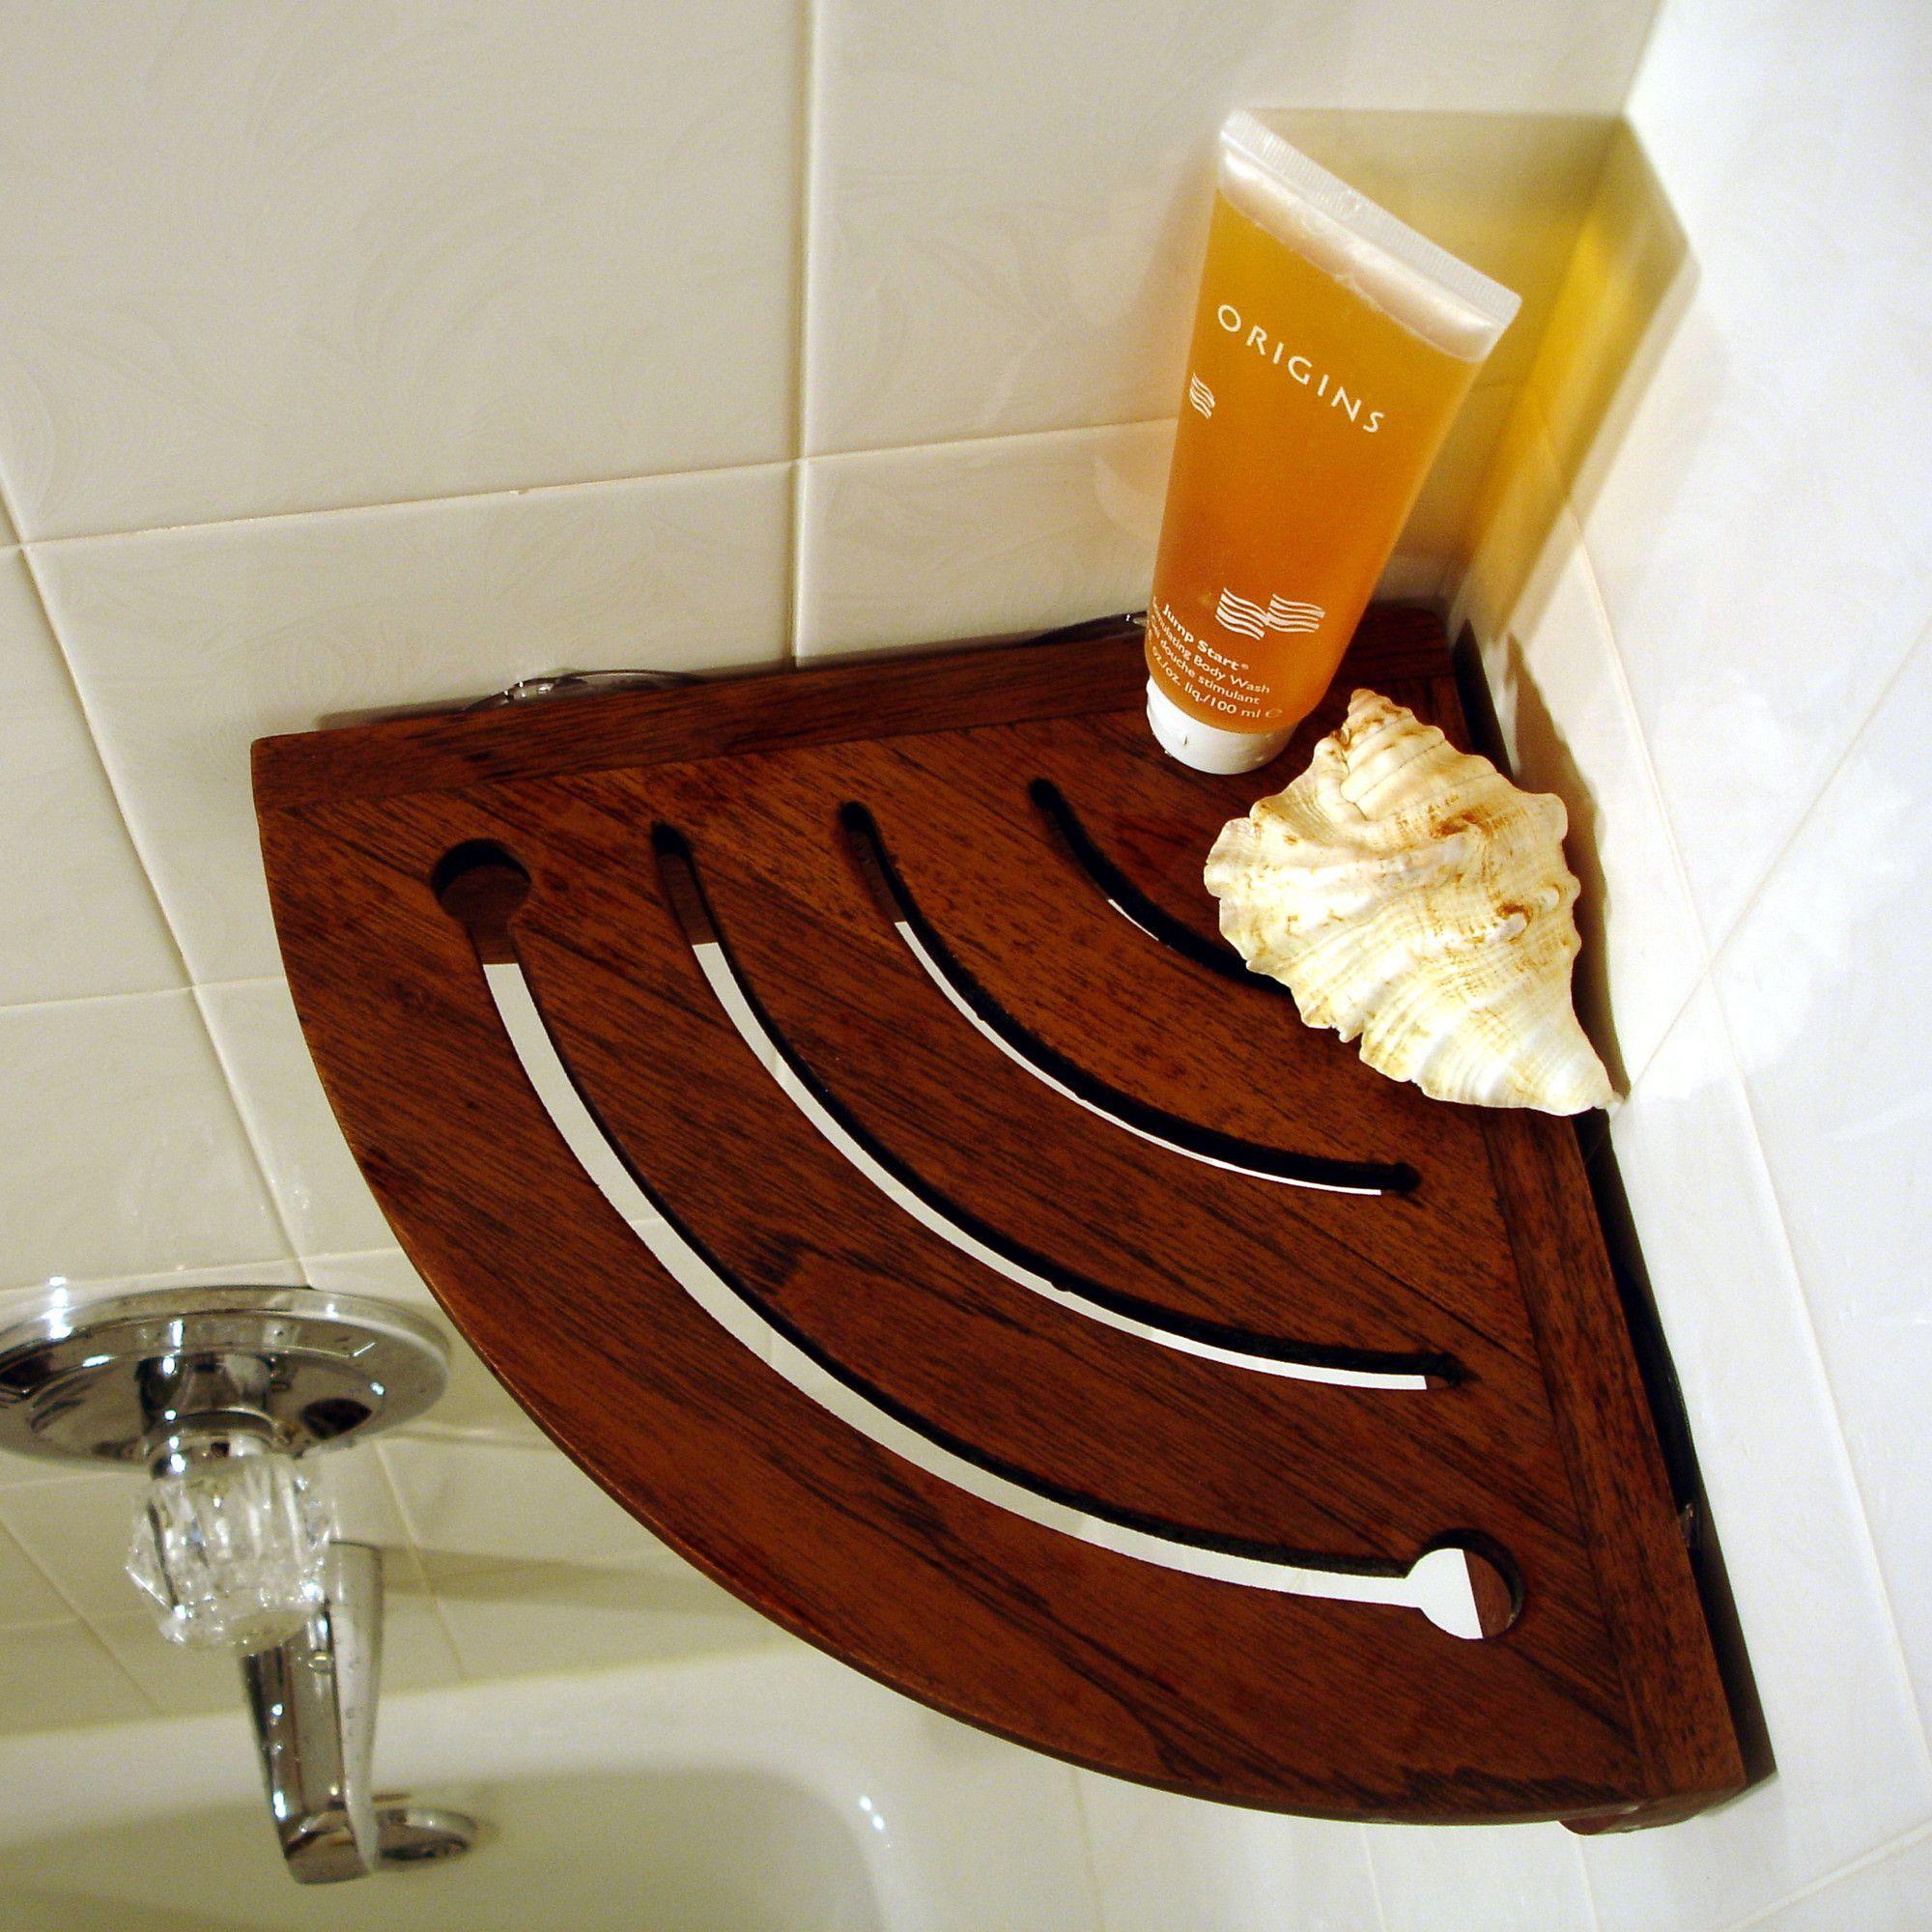 Shower Teak Spa Teak Suction Corner Shelf Would Need To Anchor It